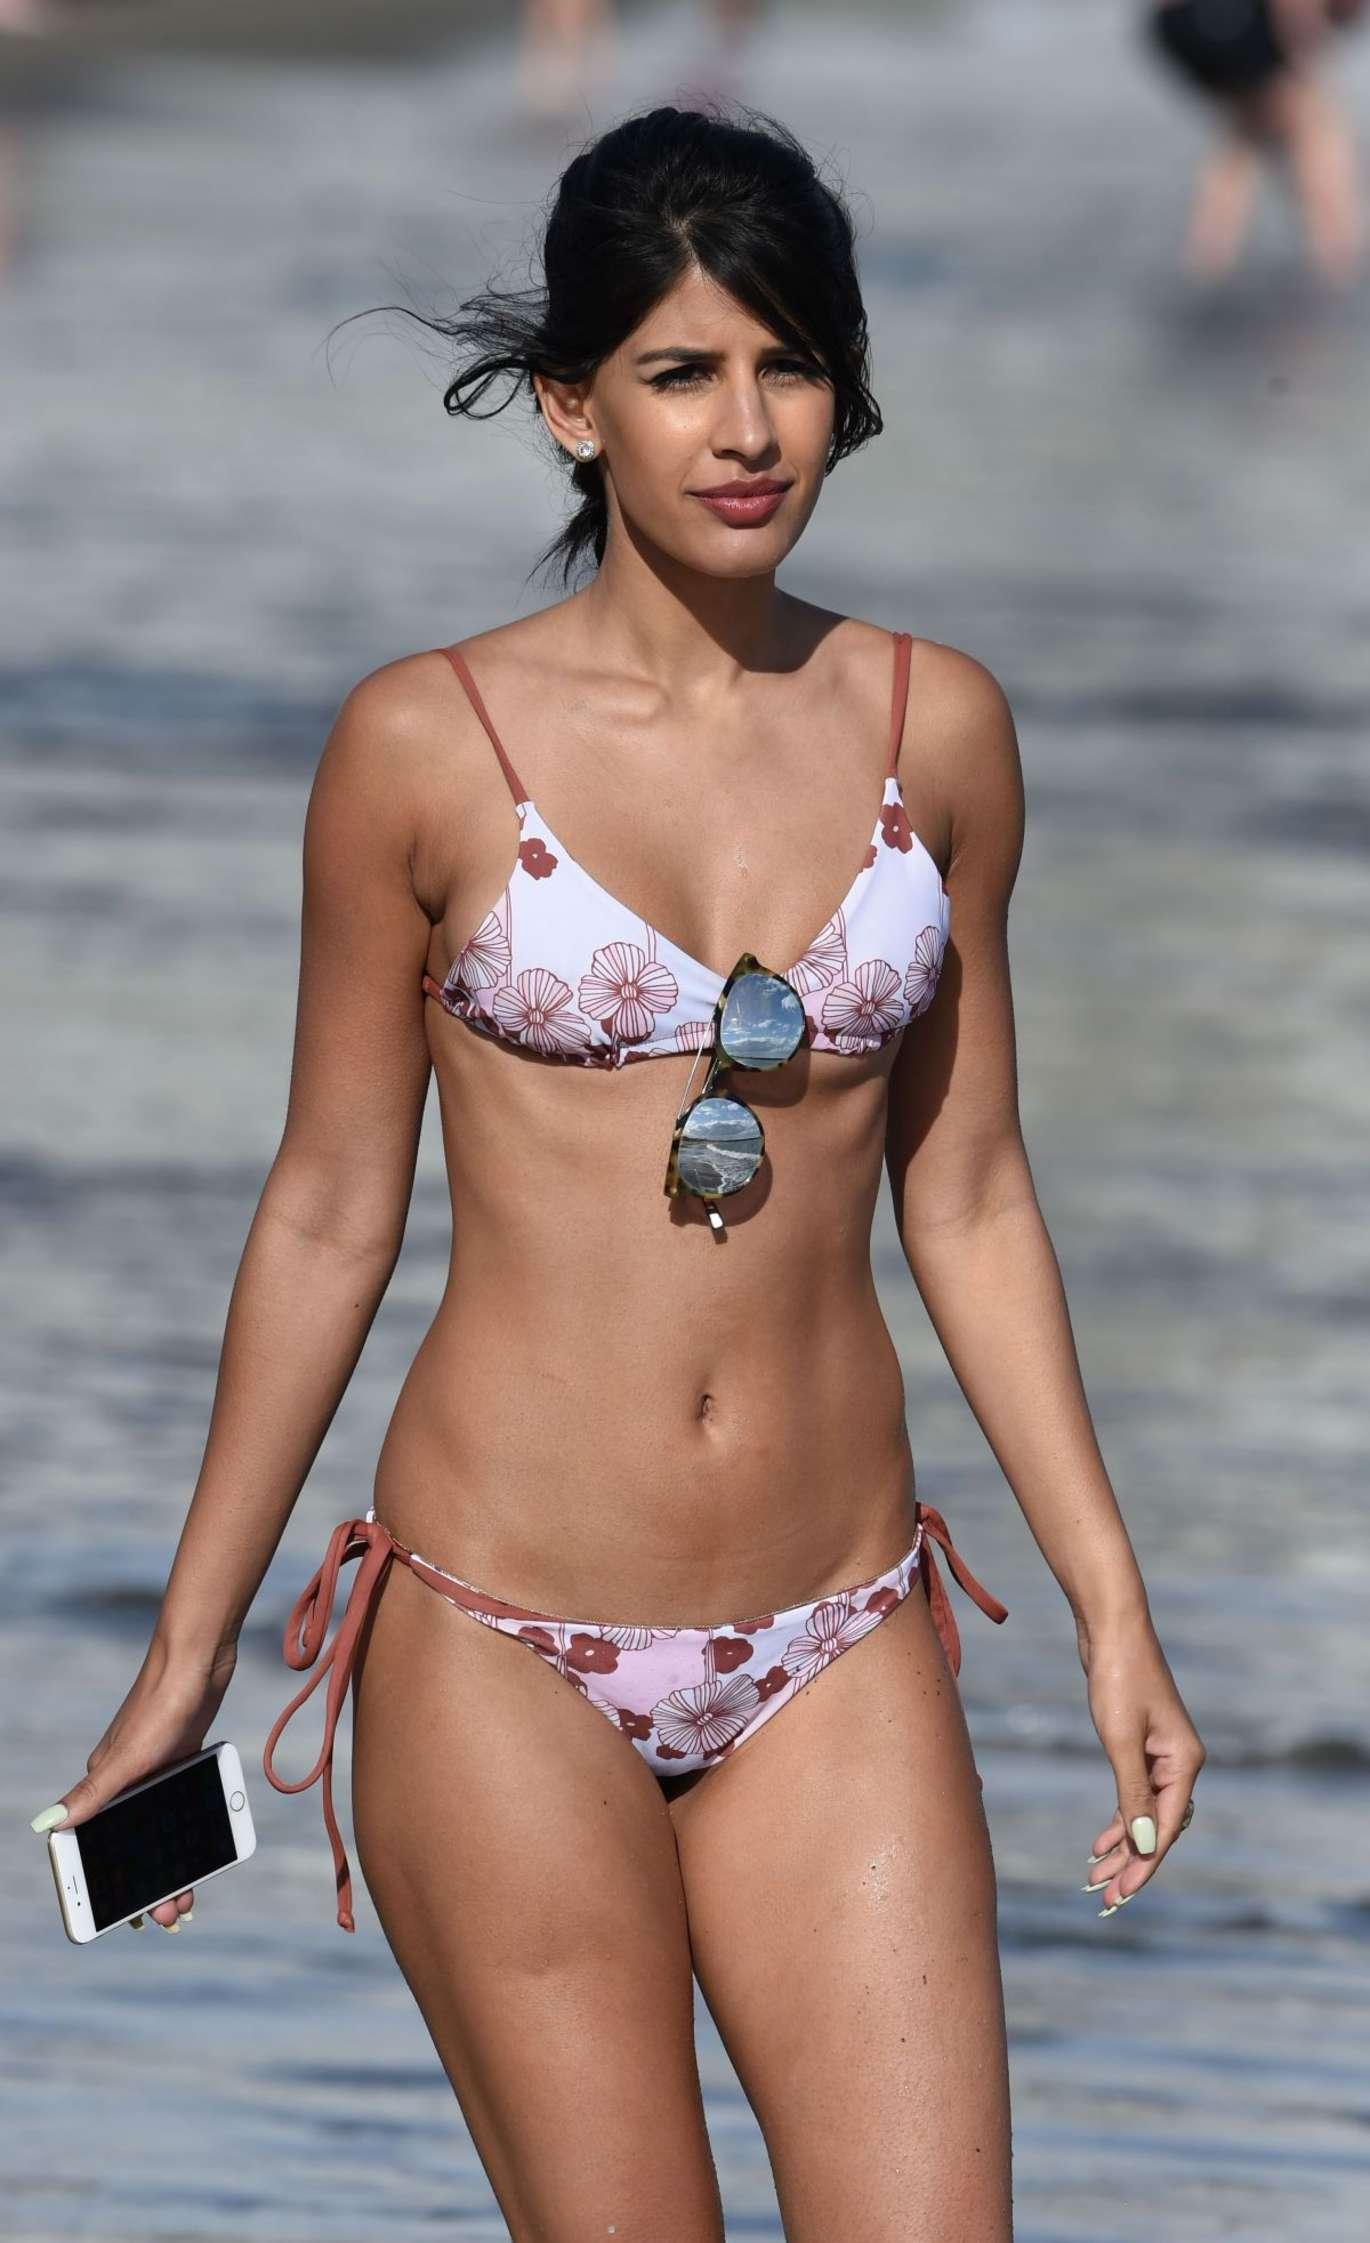 jasmin walia wearing a thong bikini in marbella 03 celebrity. Black Bedroom Furniture Sets. Home Design Ideas